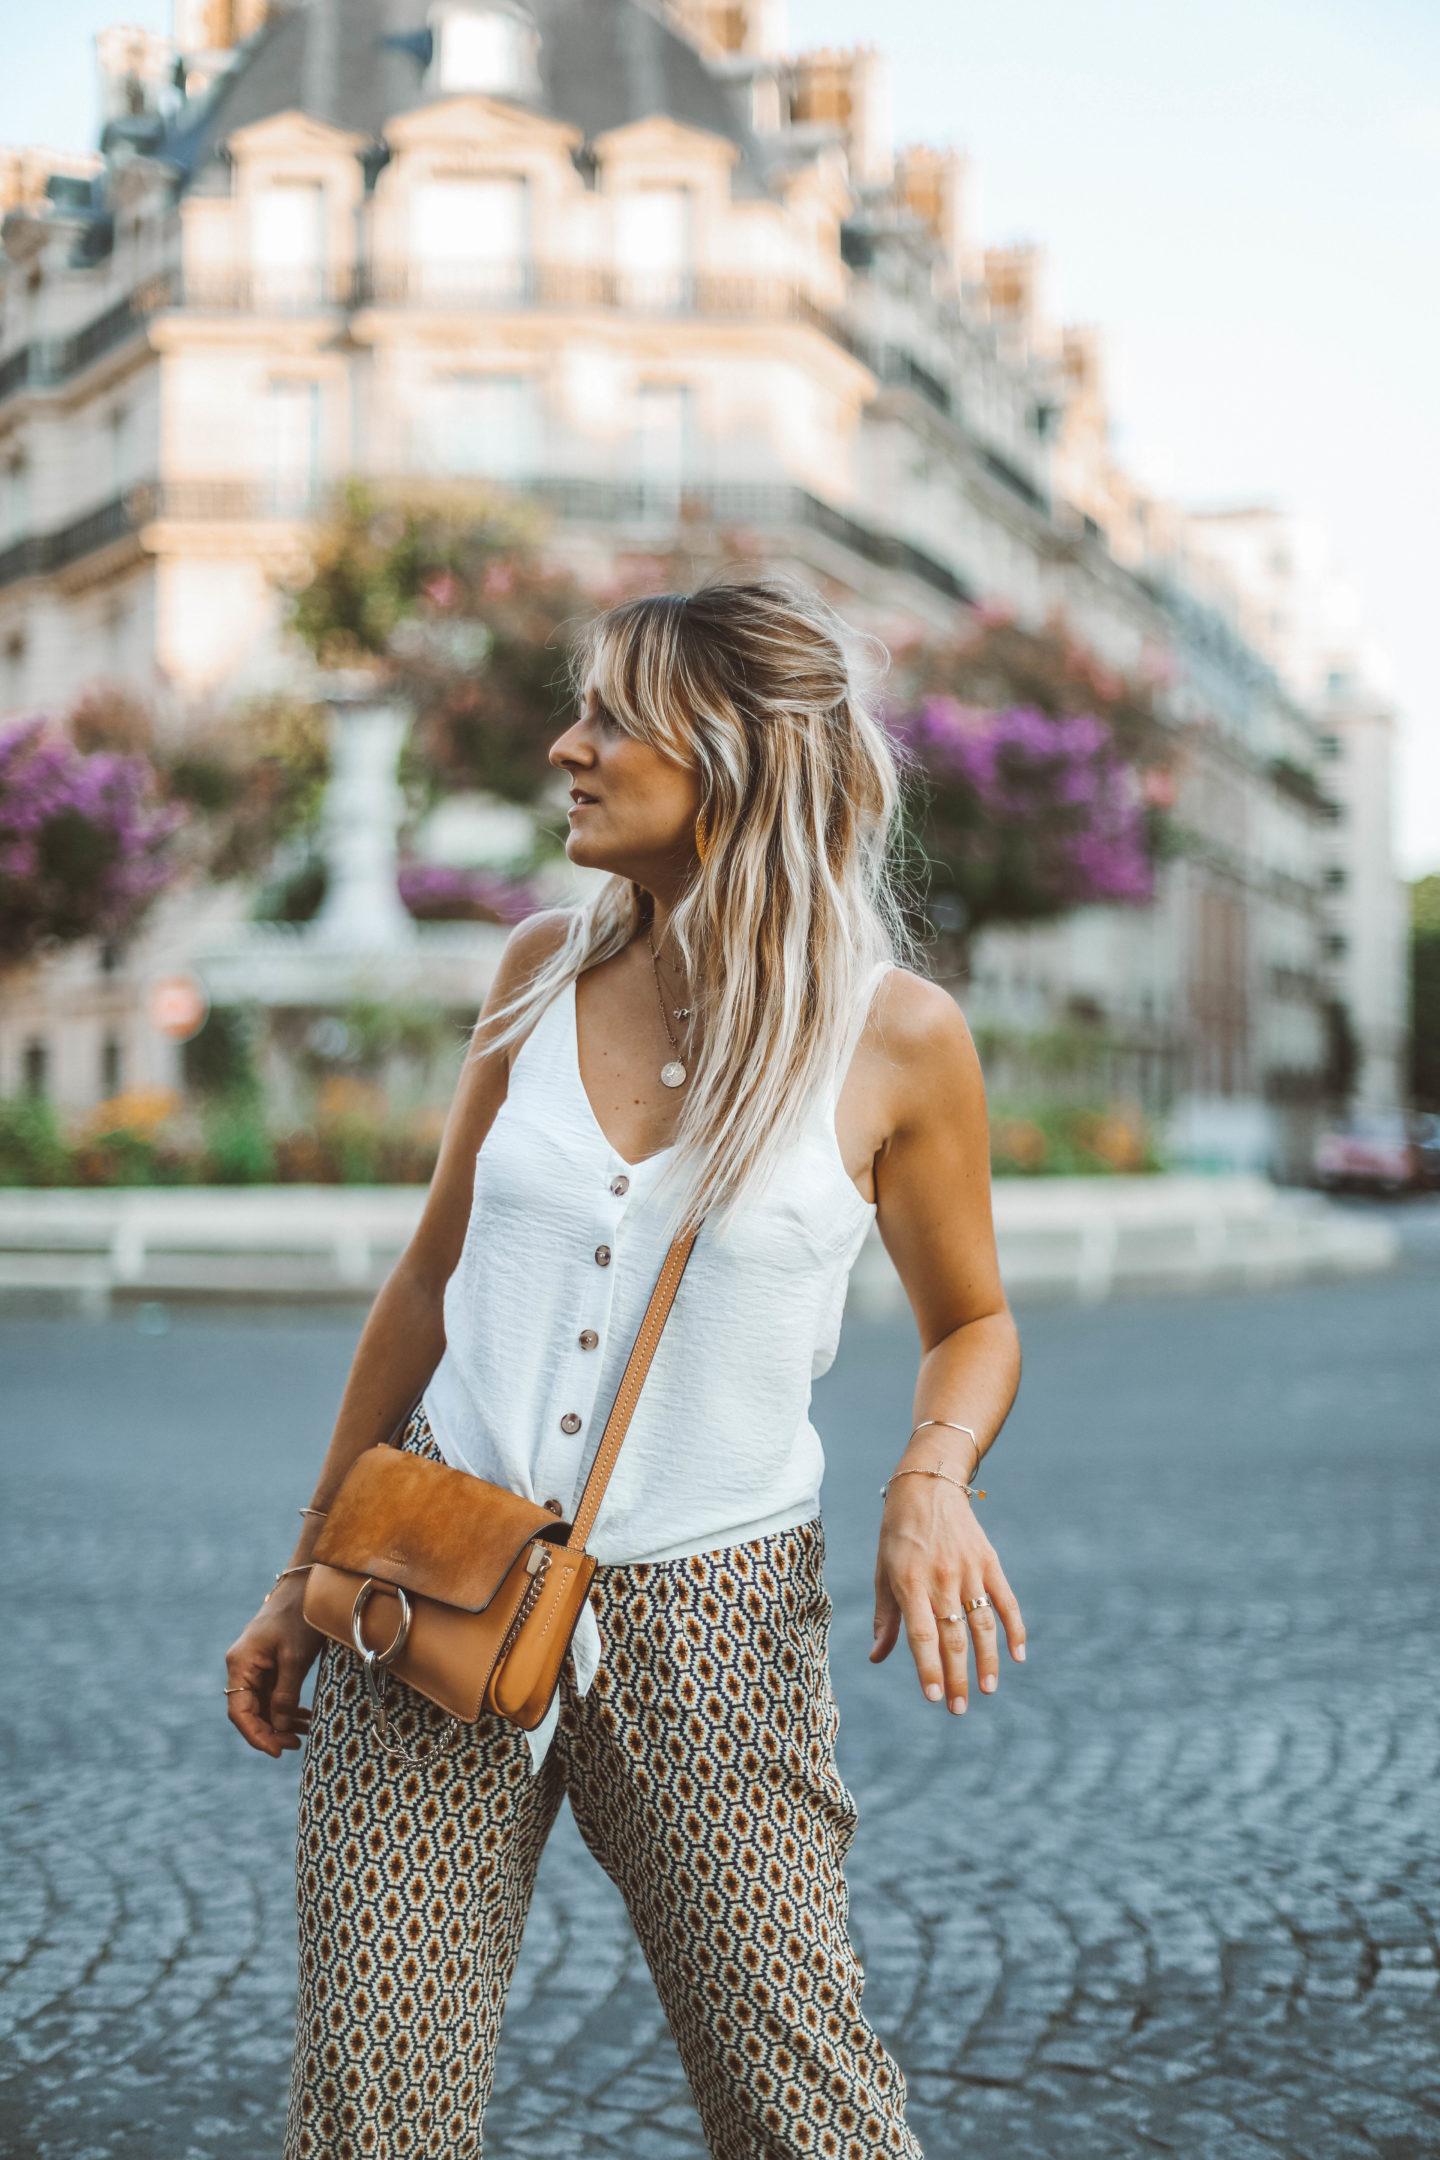 Pantalon ese O ese - Blondie Baby blog mode Paris et voyages